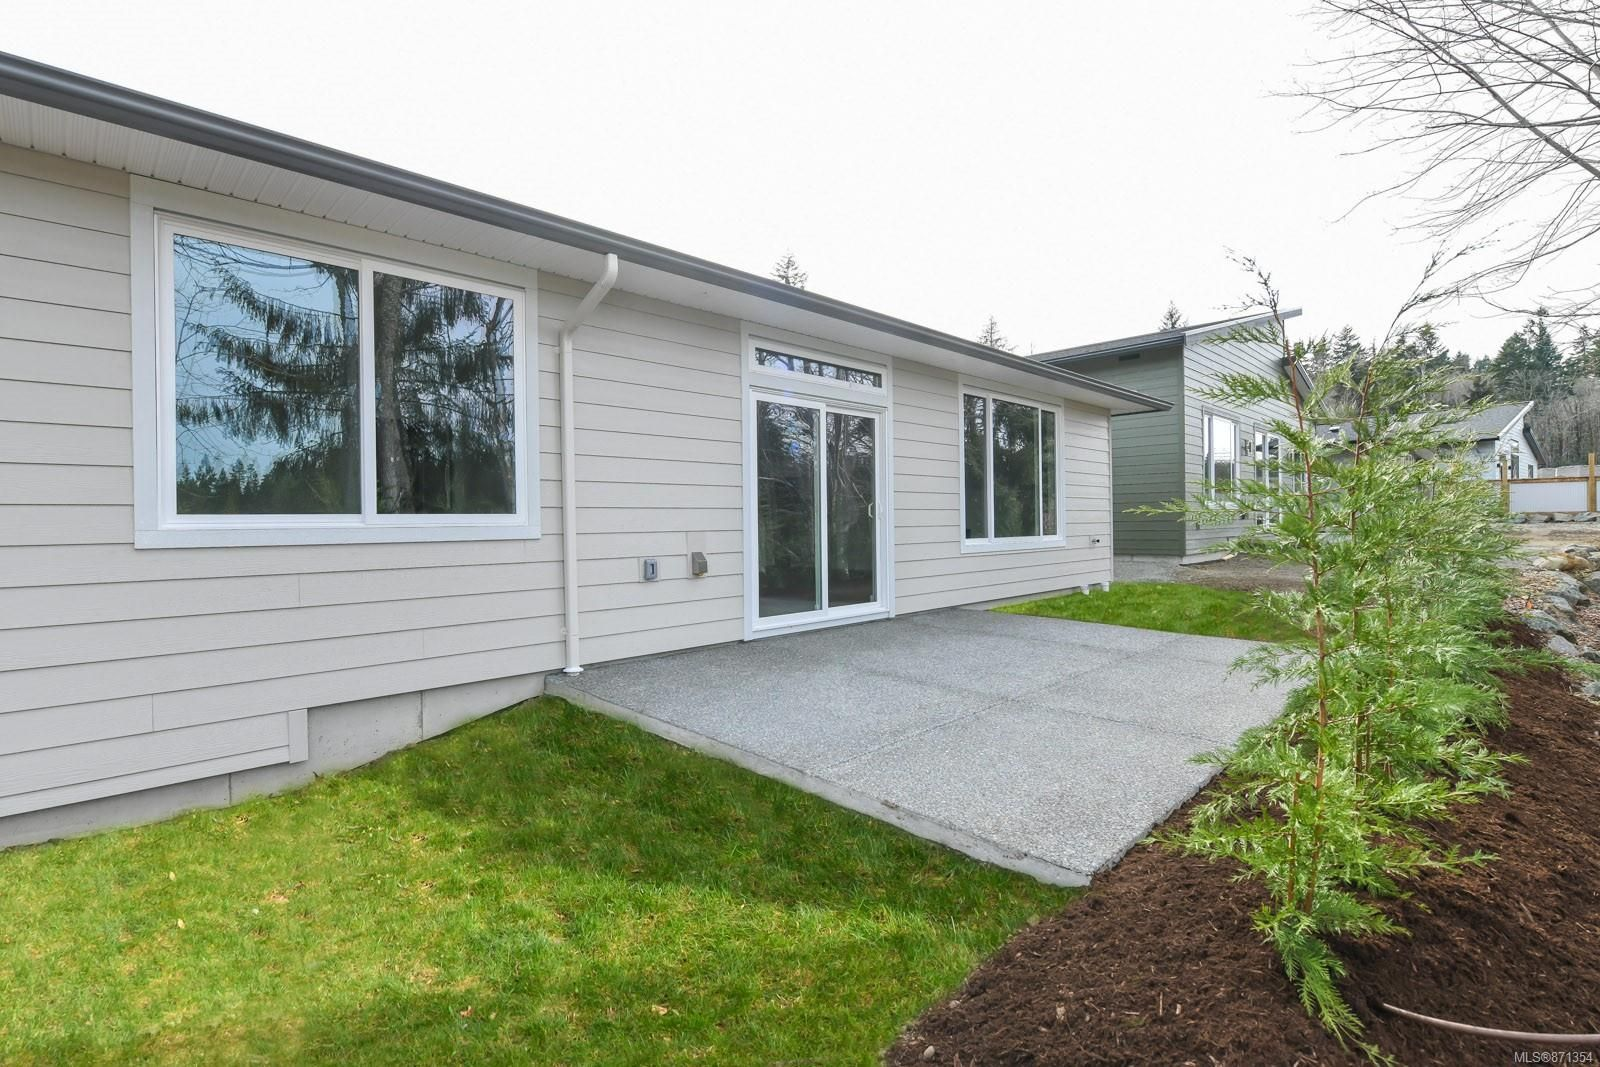 Photo 28: Photos: 68 Grayhawk Pl in : CV Courtenay City House for sale (Comox Valley)  : MLS®# 871354